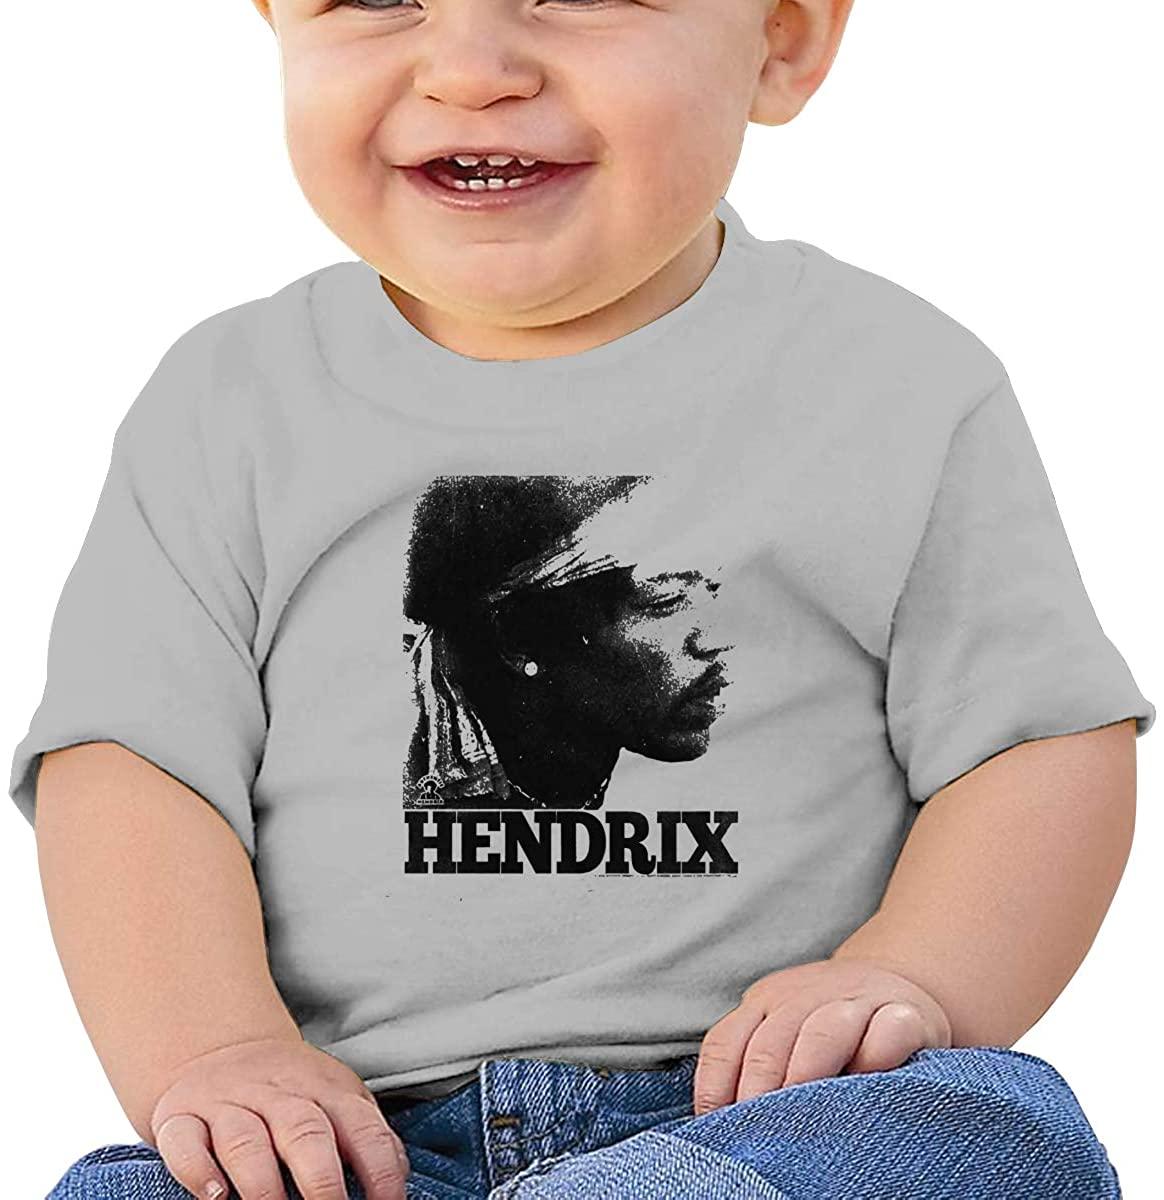 Tpoeaeoia Jimi Hendrixbaby Boys' T-Shirts, Organic Short Sleeve Round Neck Tees